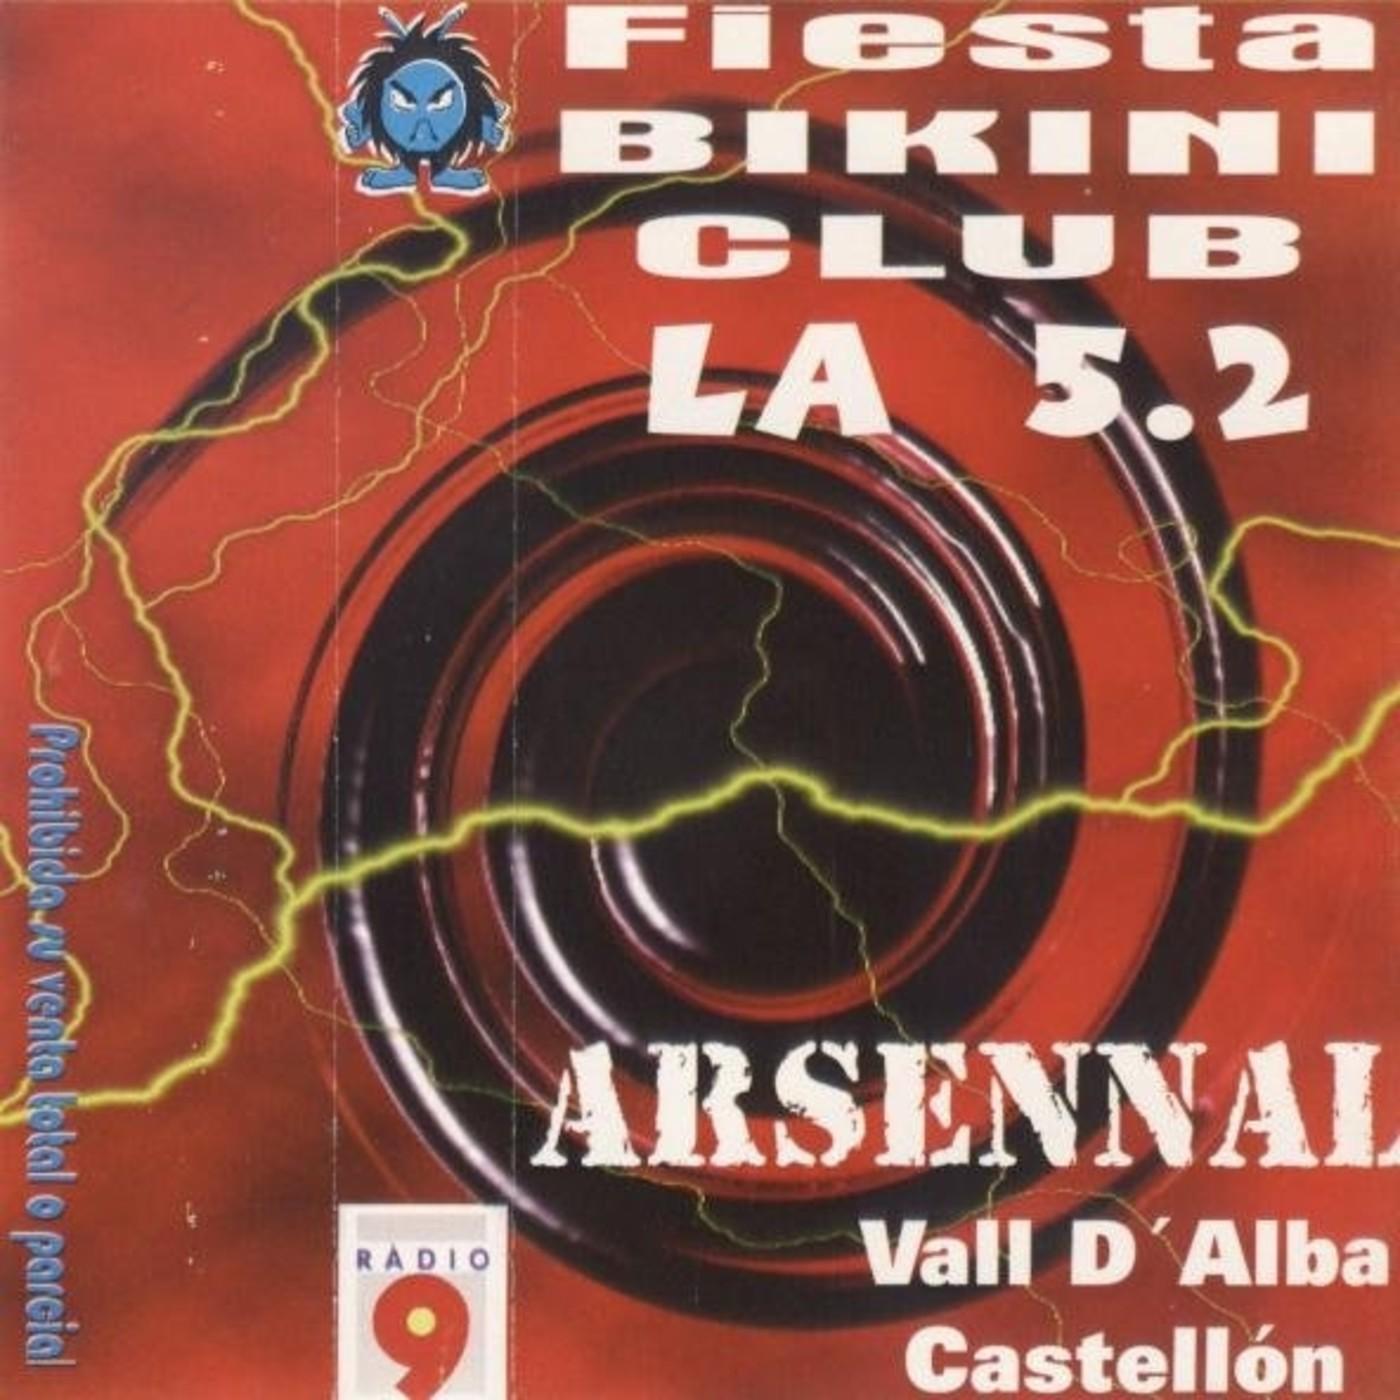 52ArsennalVall 04 Festa Bikini 9 Club 1999Radio D'alba24 jqL5c34AR